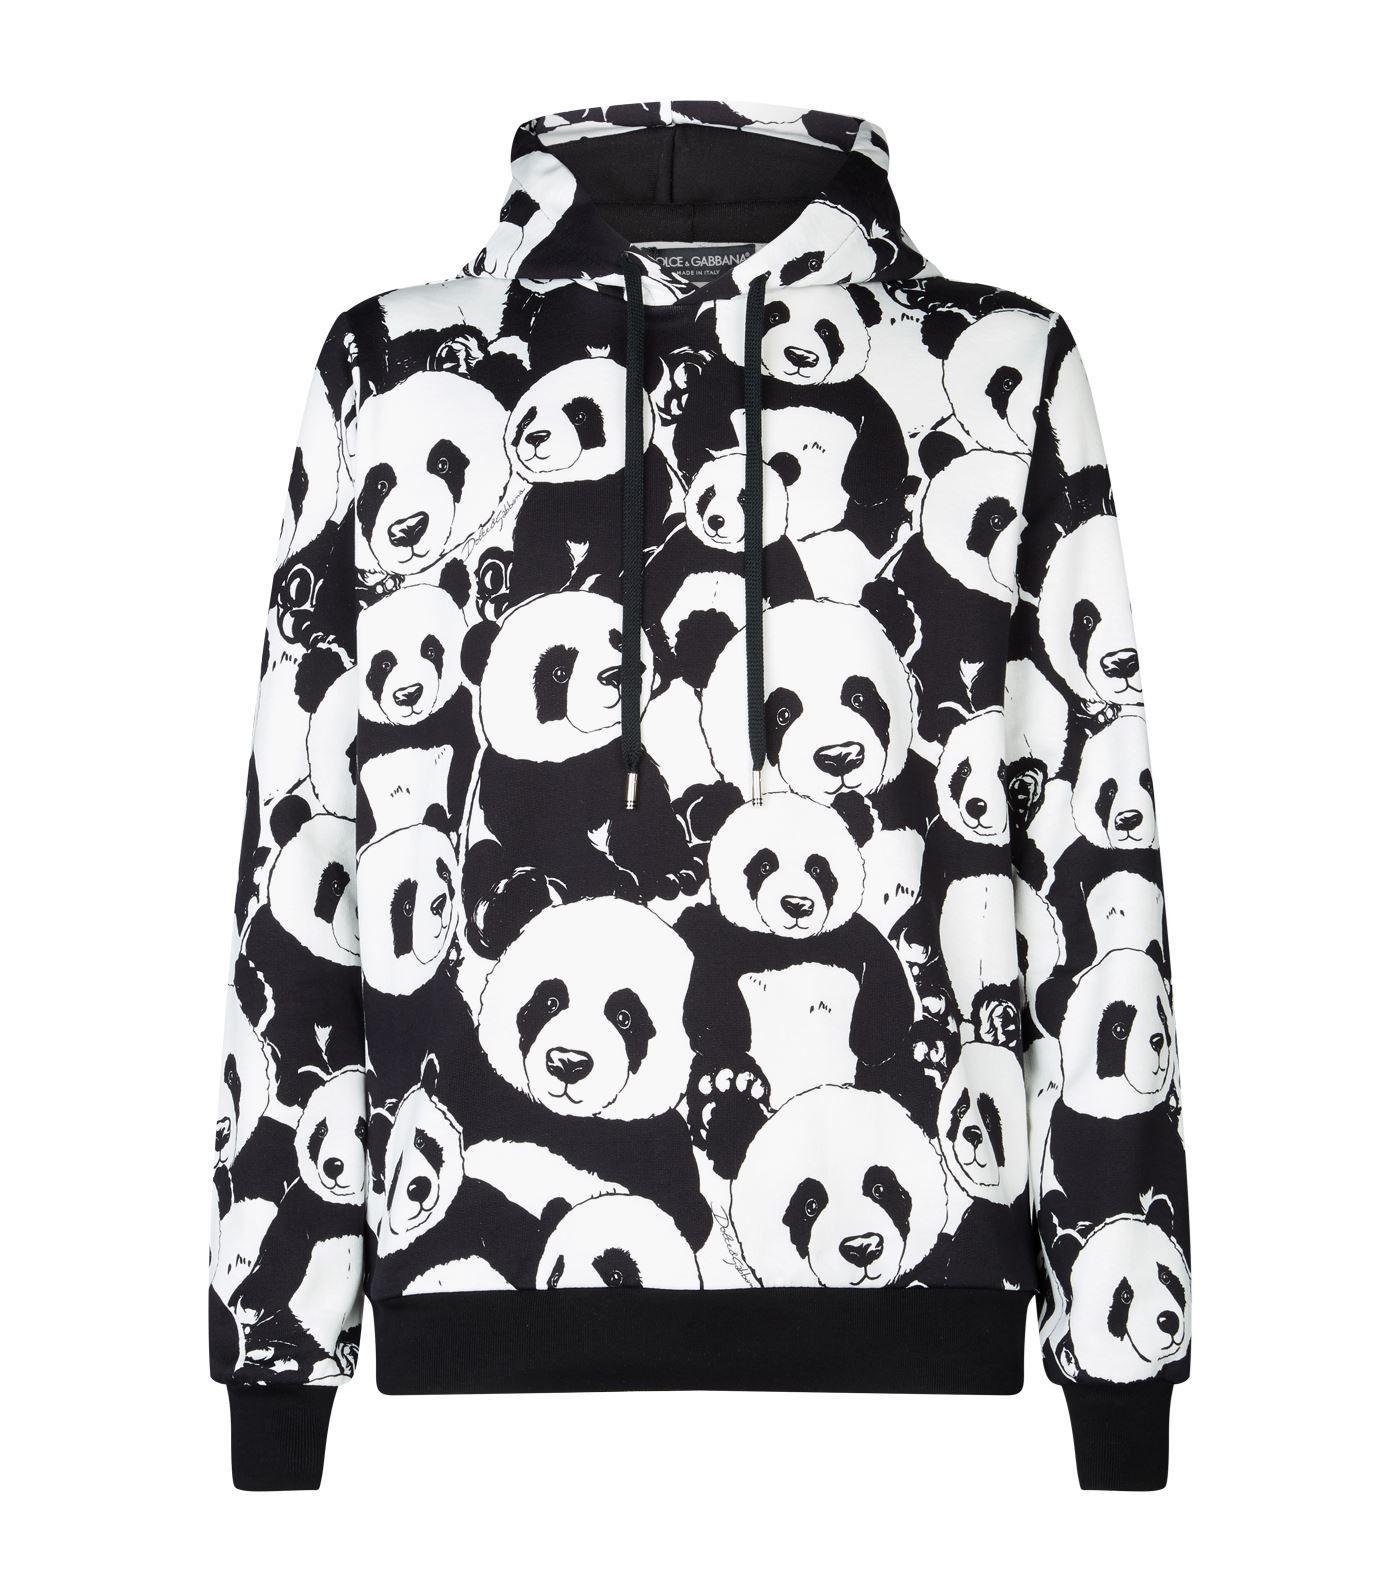 Dolce & Gabbana Panda Printed Bomber Jacket In Black